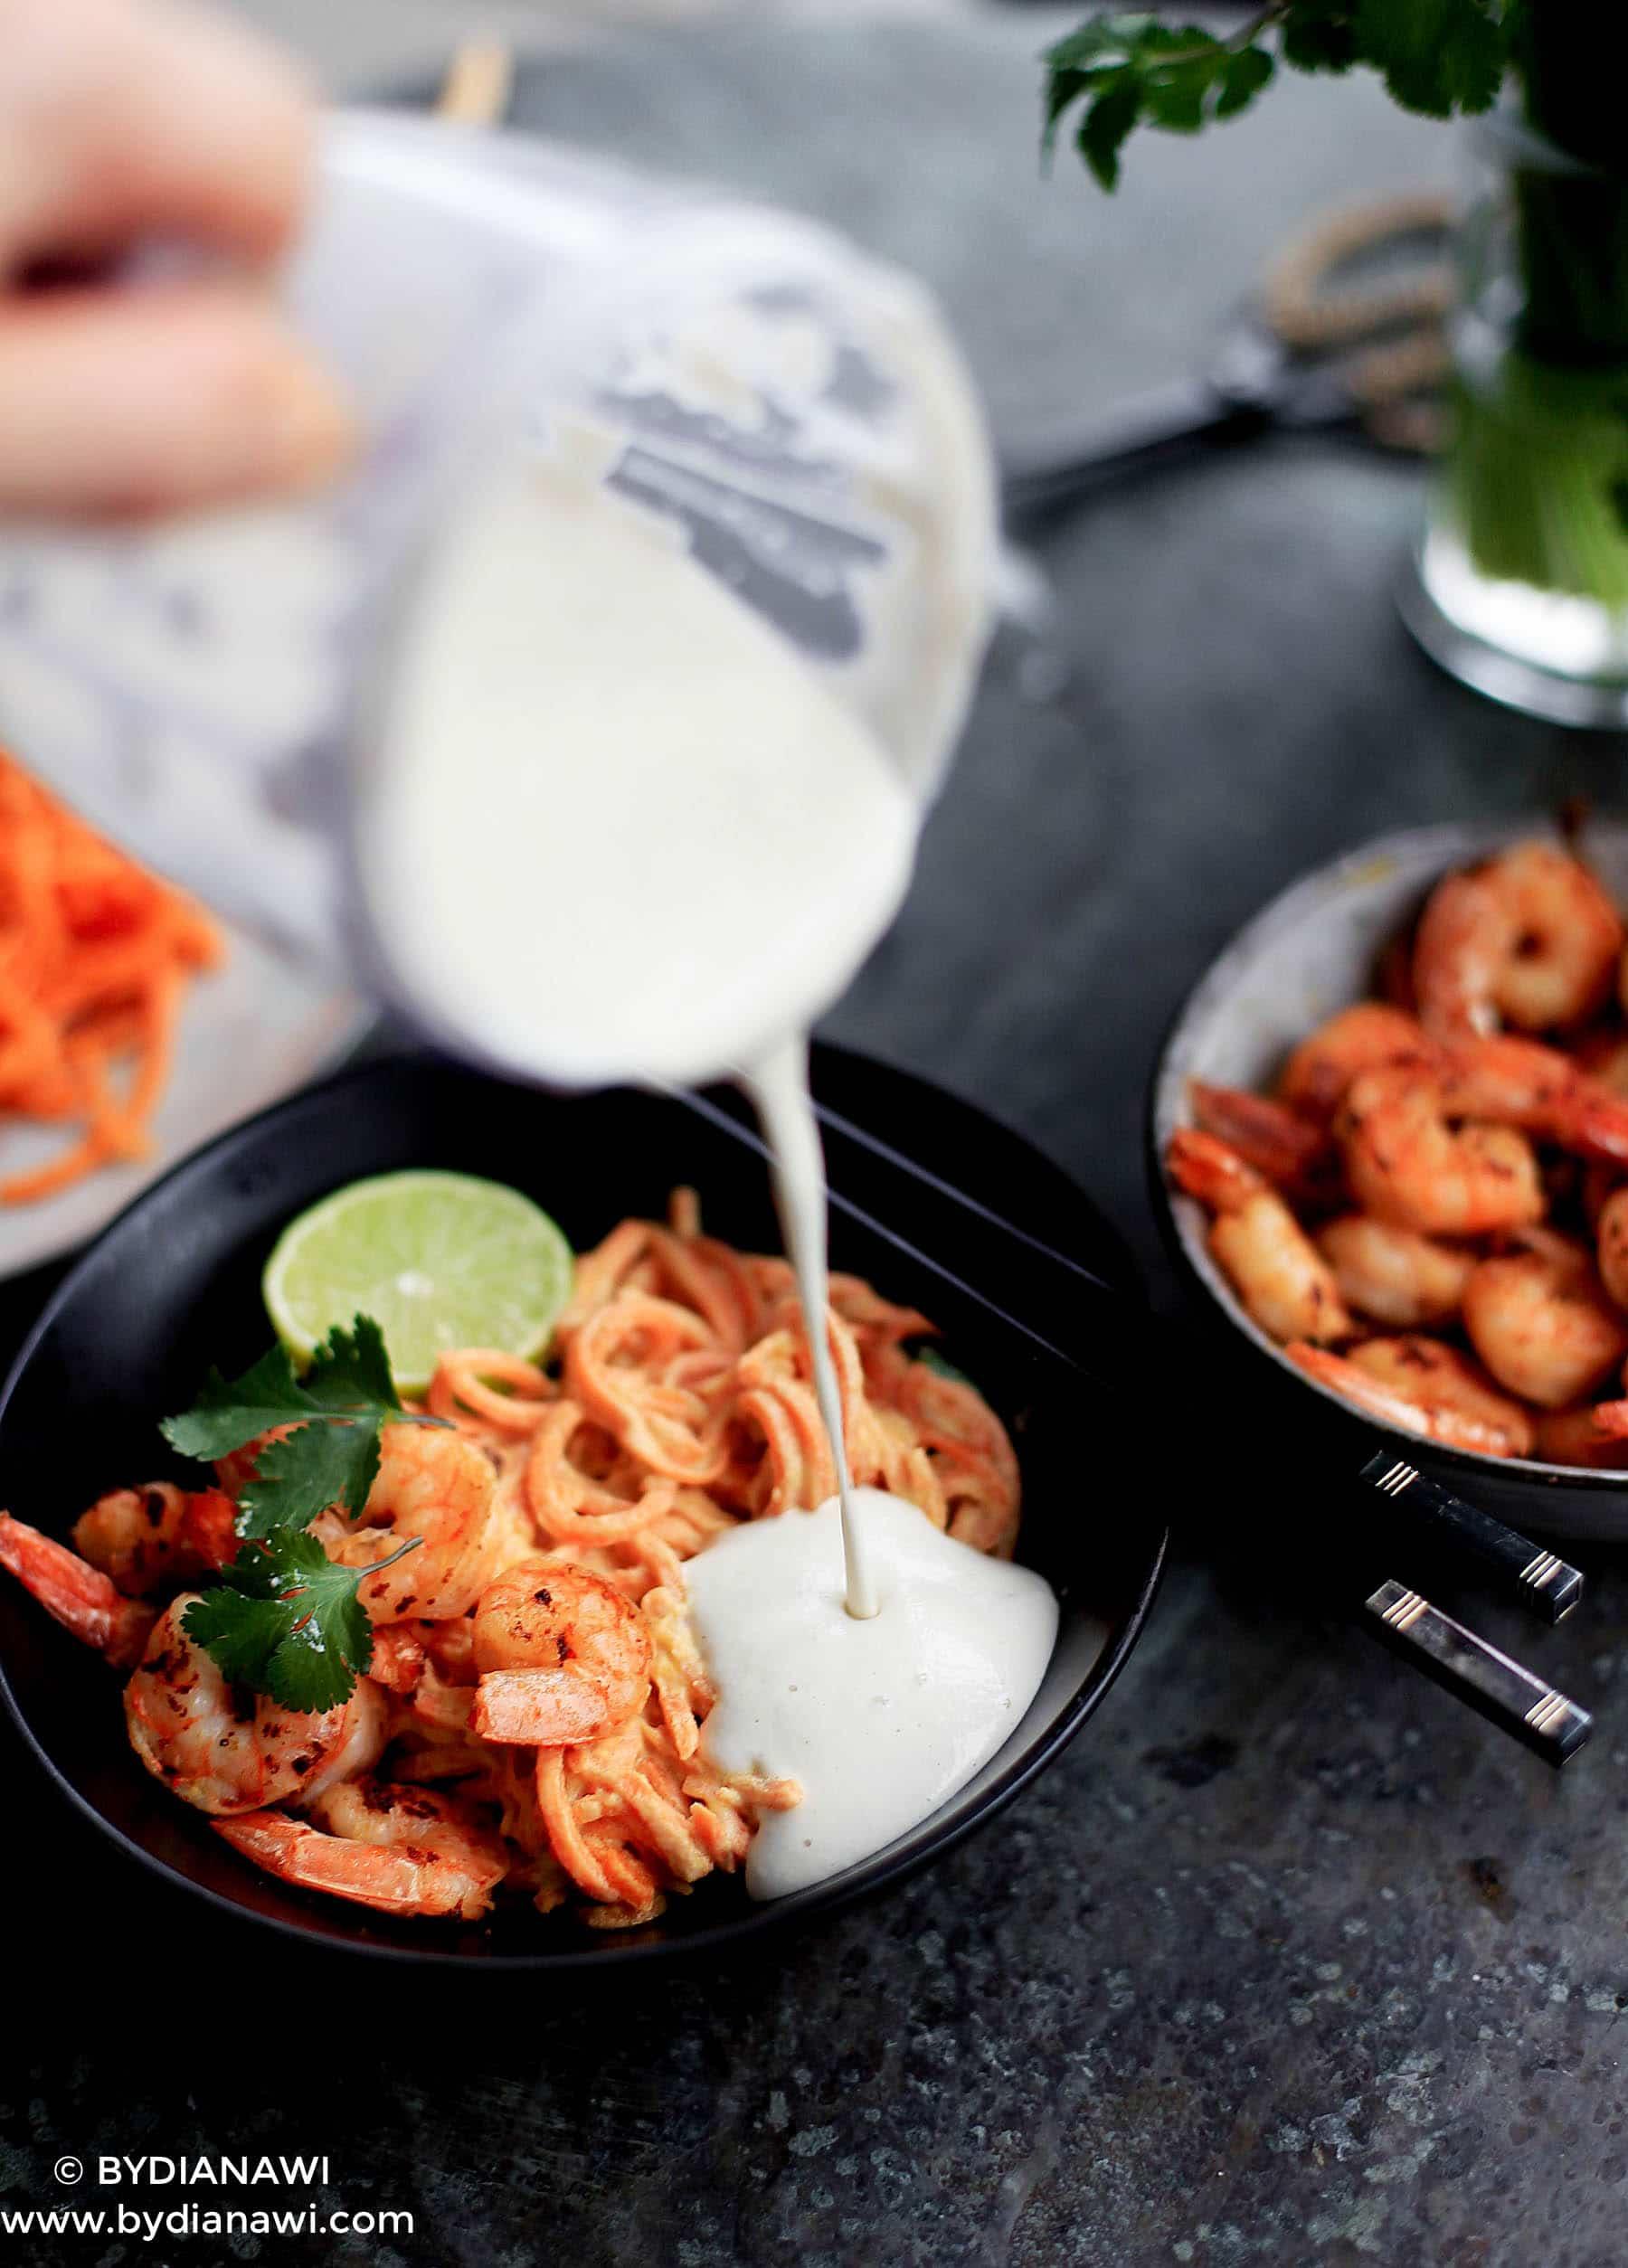 grøntsagsnudler, sund aftensmad, vegetarmad, low carb, vannamei rejer